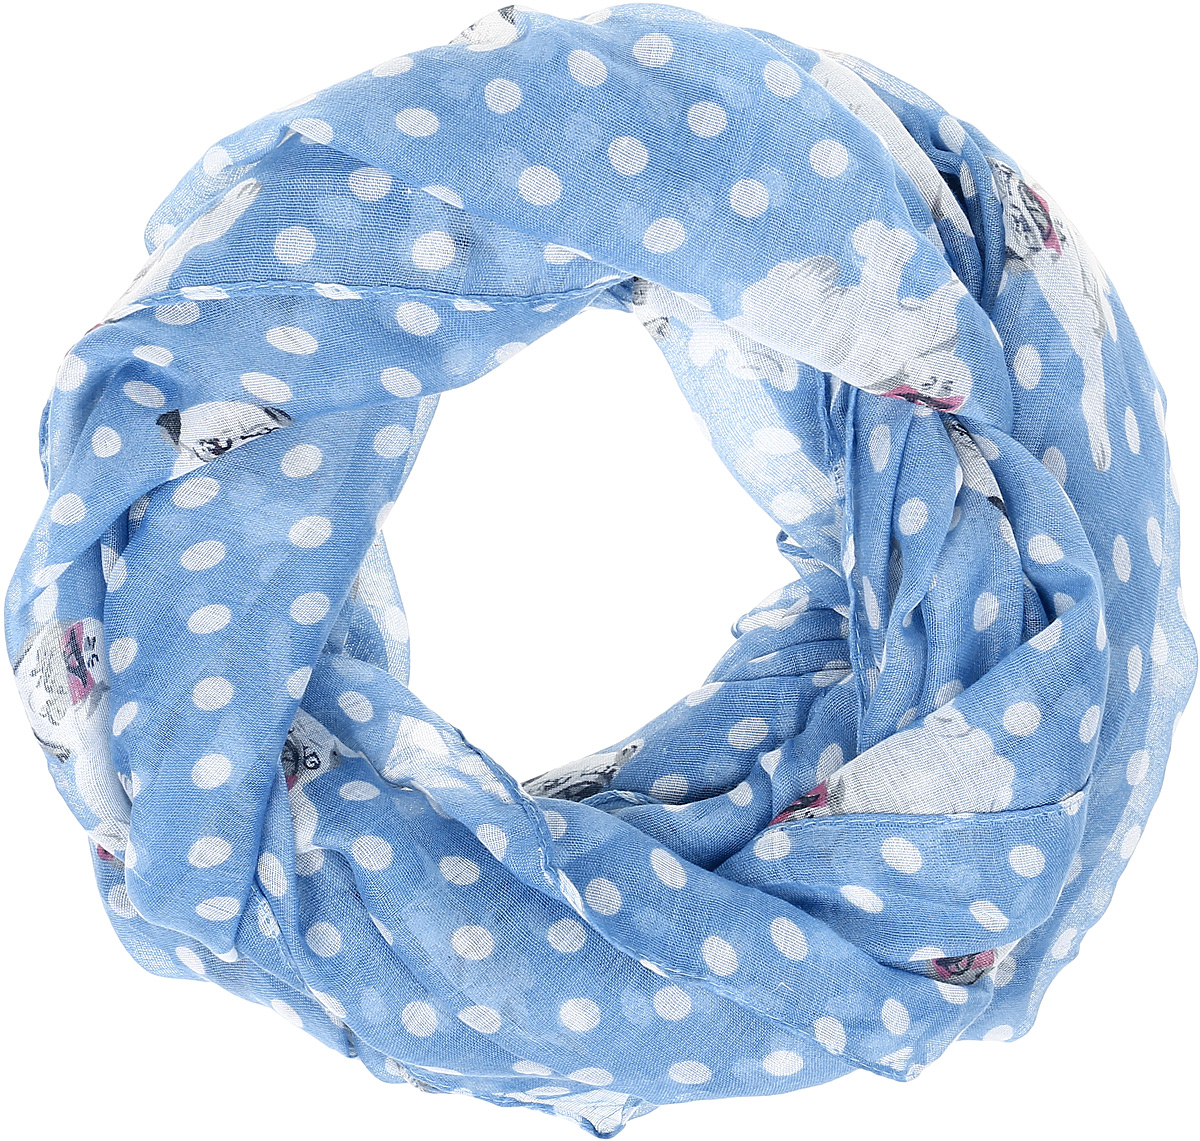 Палантин женский Vittorio Richi, цвет: голубой. Ro02РР1619/1-2. Размер 90 см х 180 смRo02РР1619/1-2Легкий широкий палантин с принтом.